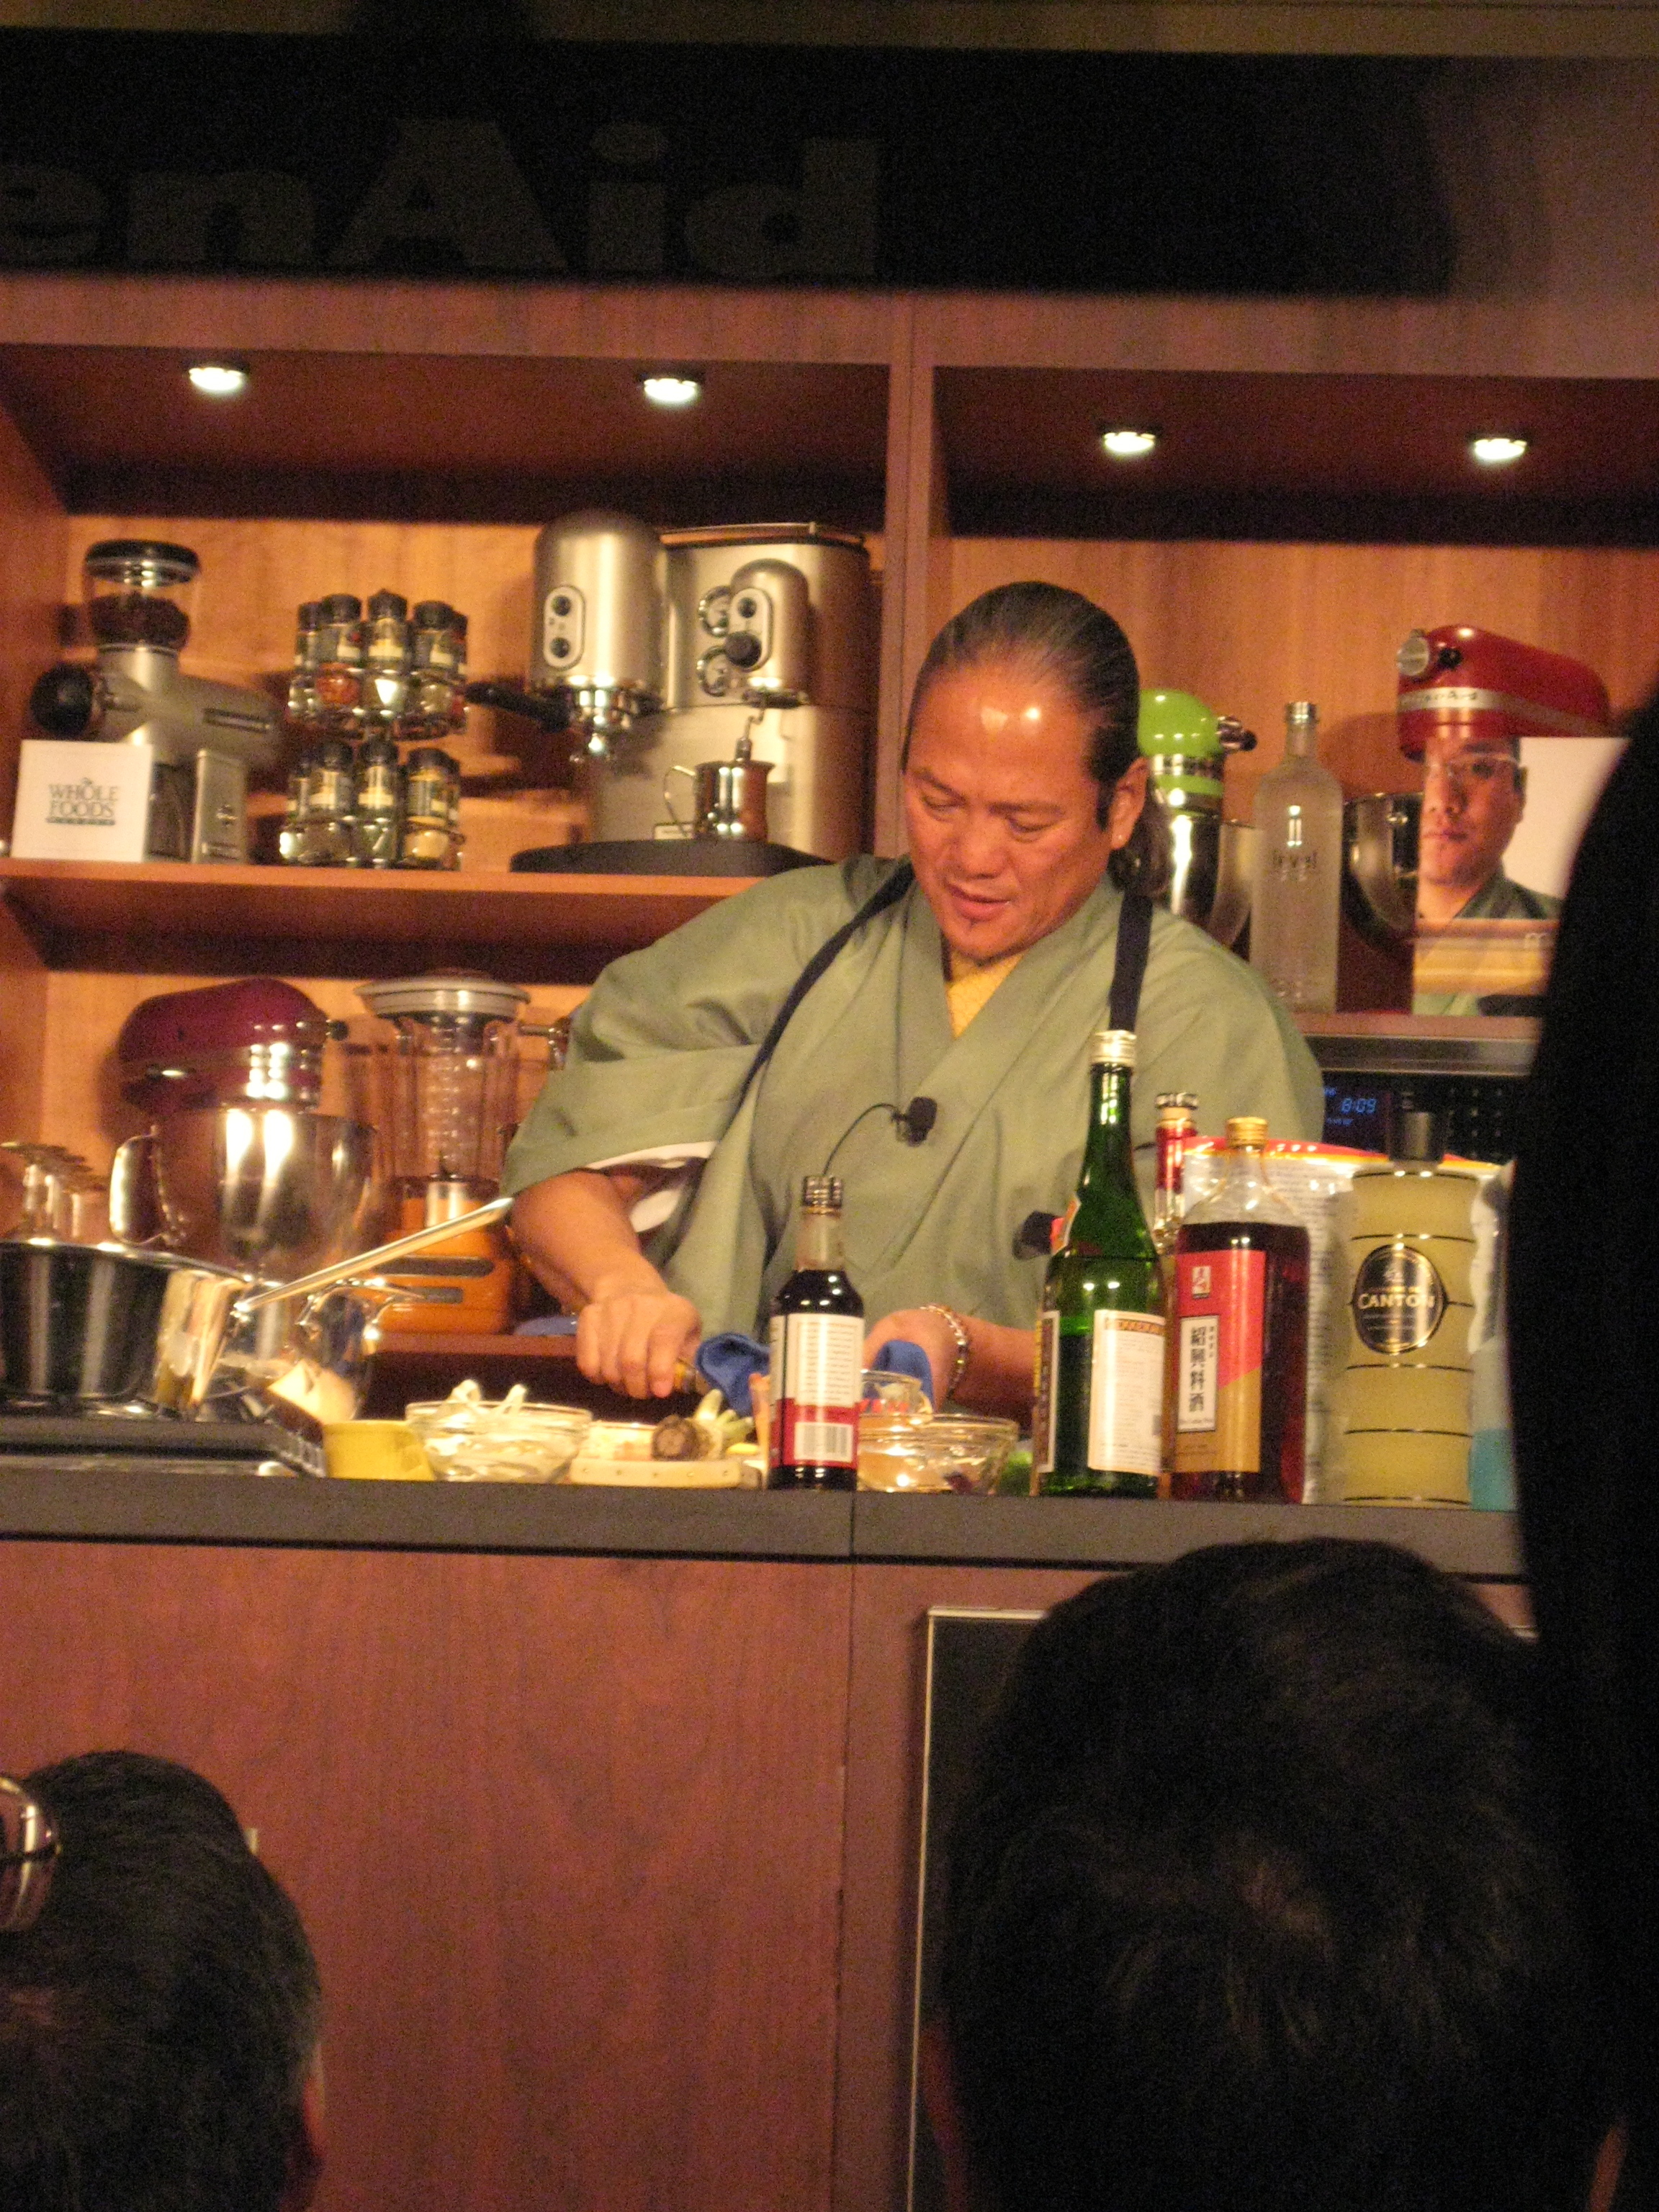 Morimoto rolls sushi.